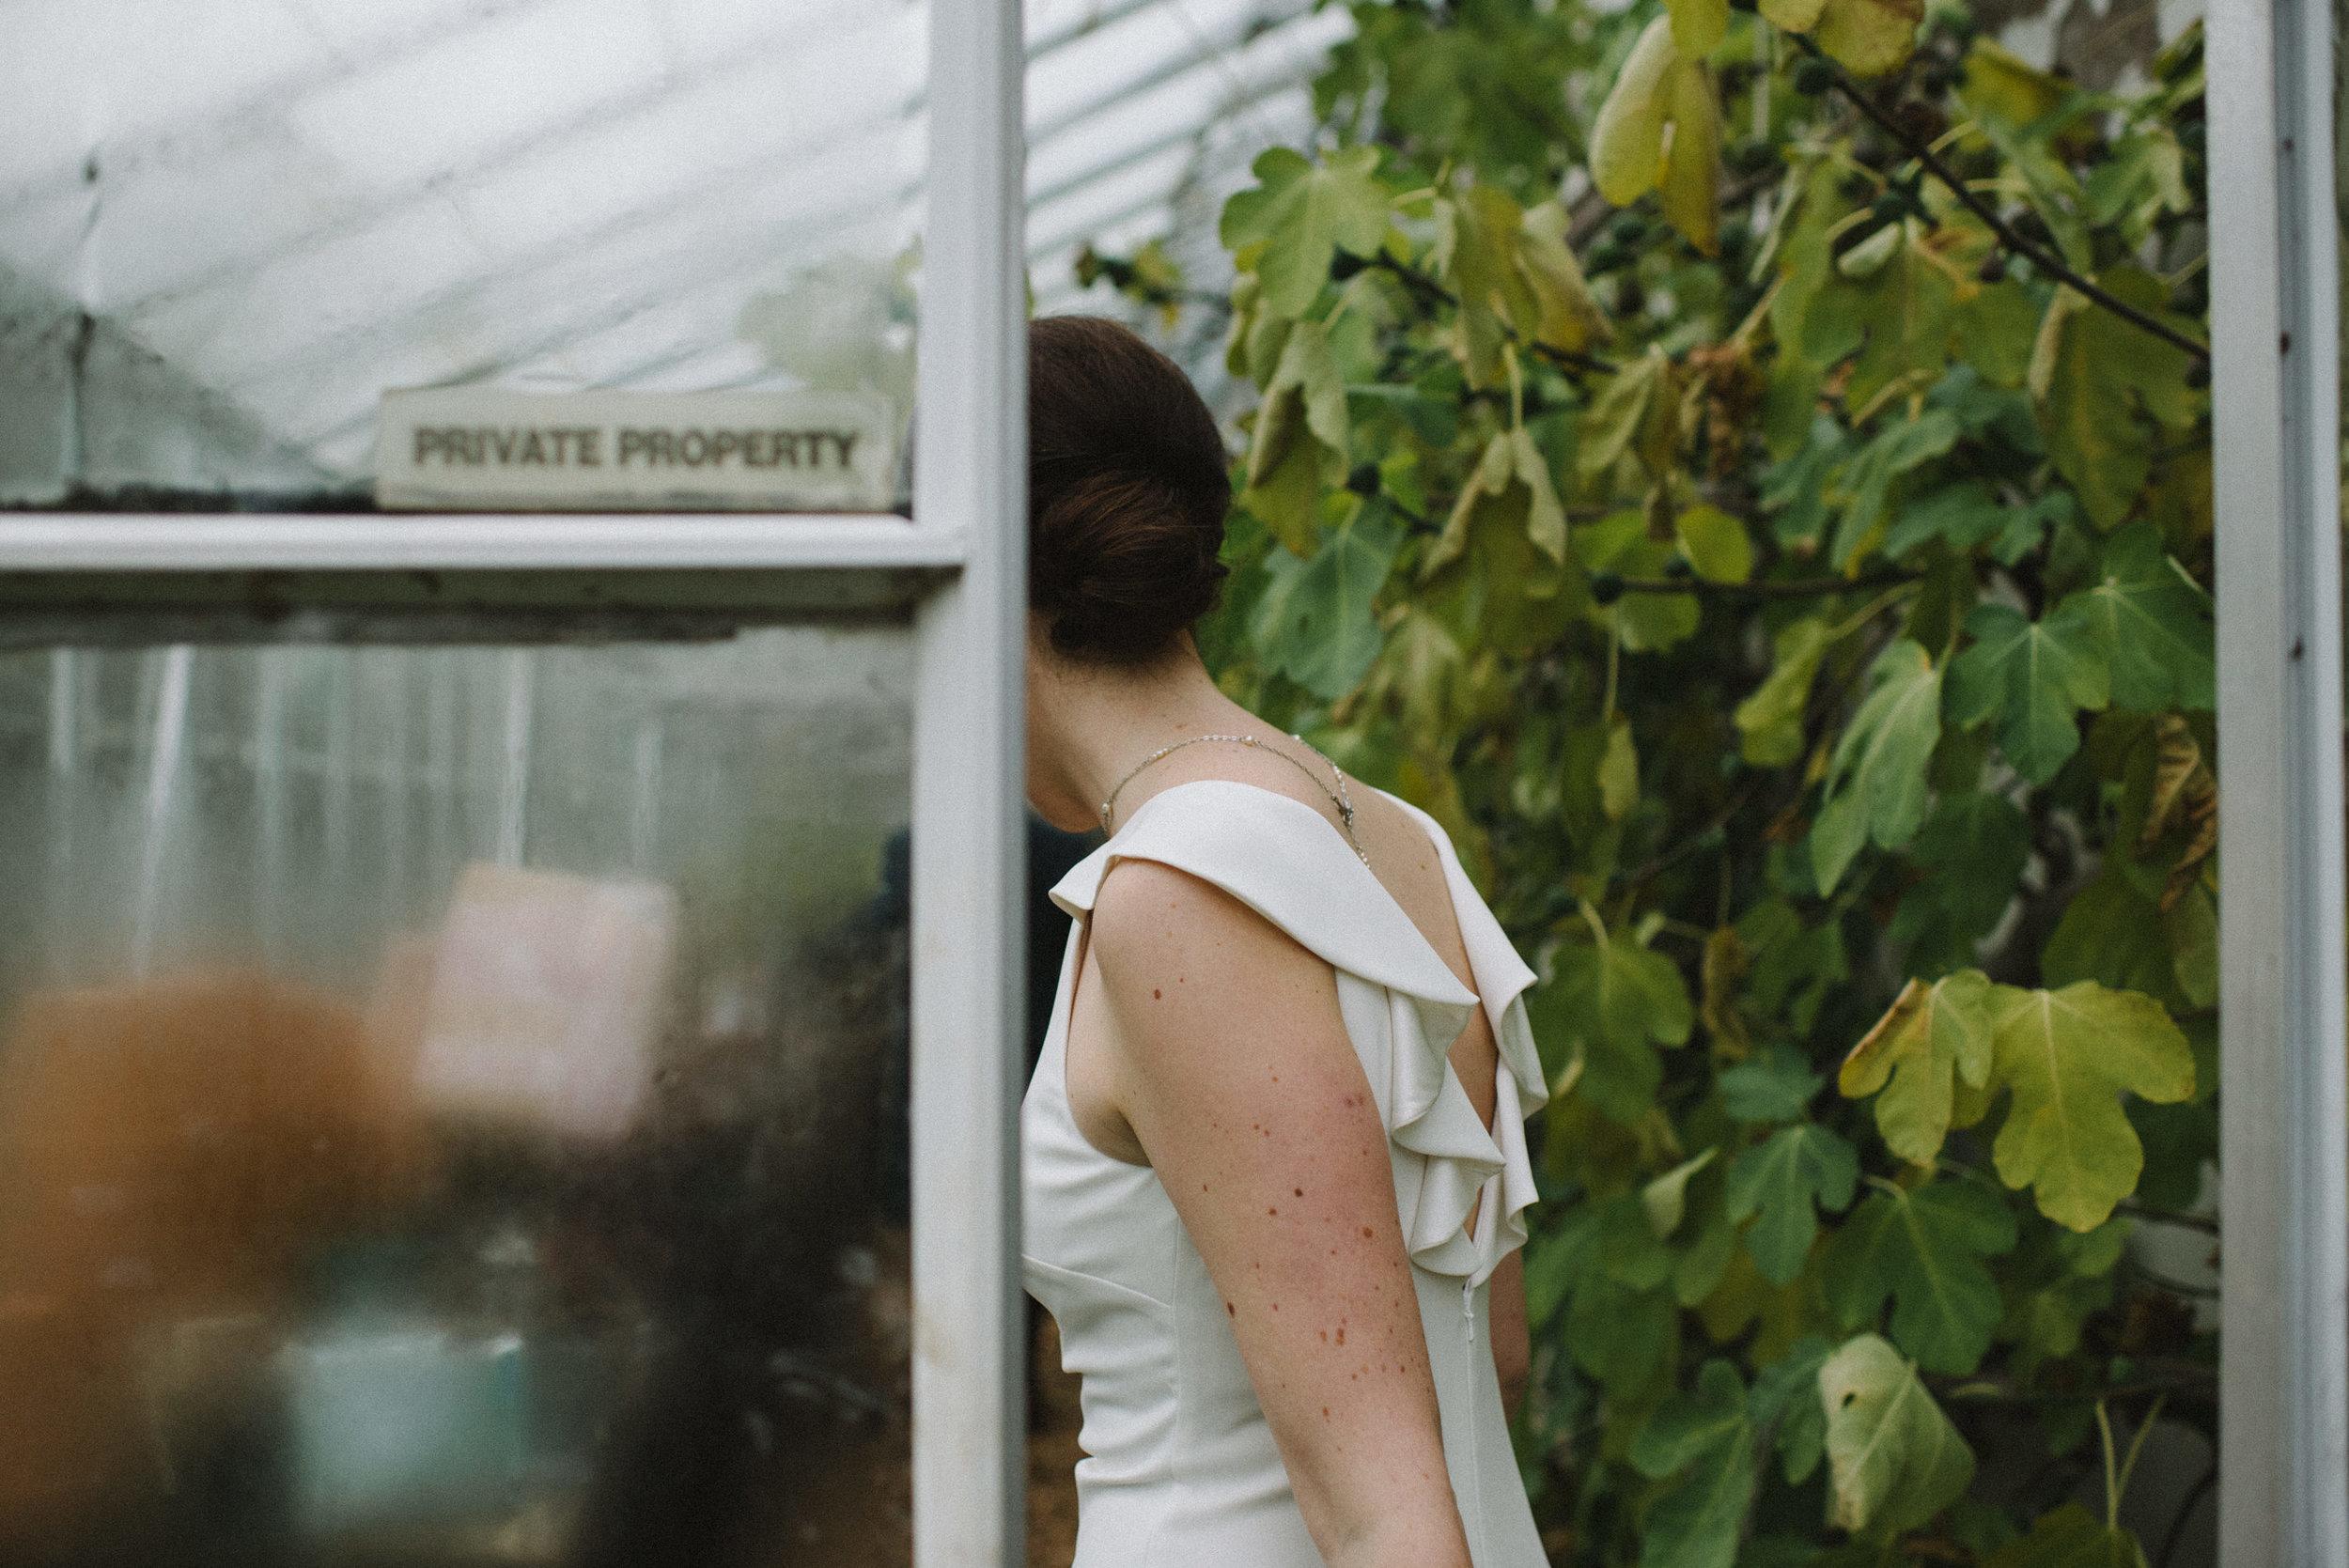 0084-LISA-DEVINE-PHOTOGRAPHY-ALTERNATIVE-WEDDING-PHOTOGRAPHY-SCOTLAND-DESTINATION-WEDDINGS-GLASGOW-WEDDINGS-COOL-WEDDINGS-STYLISH-WEDDINGS.JPG